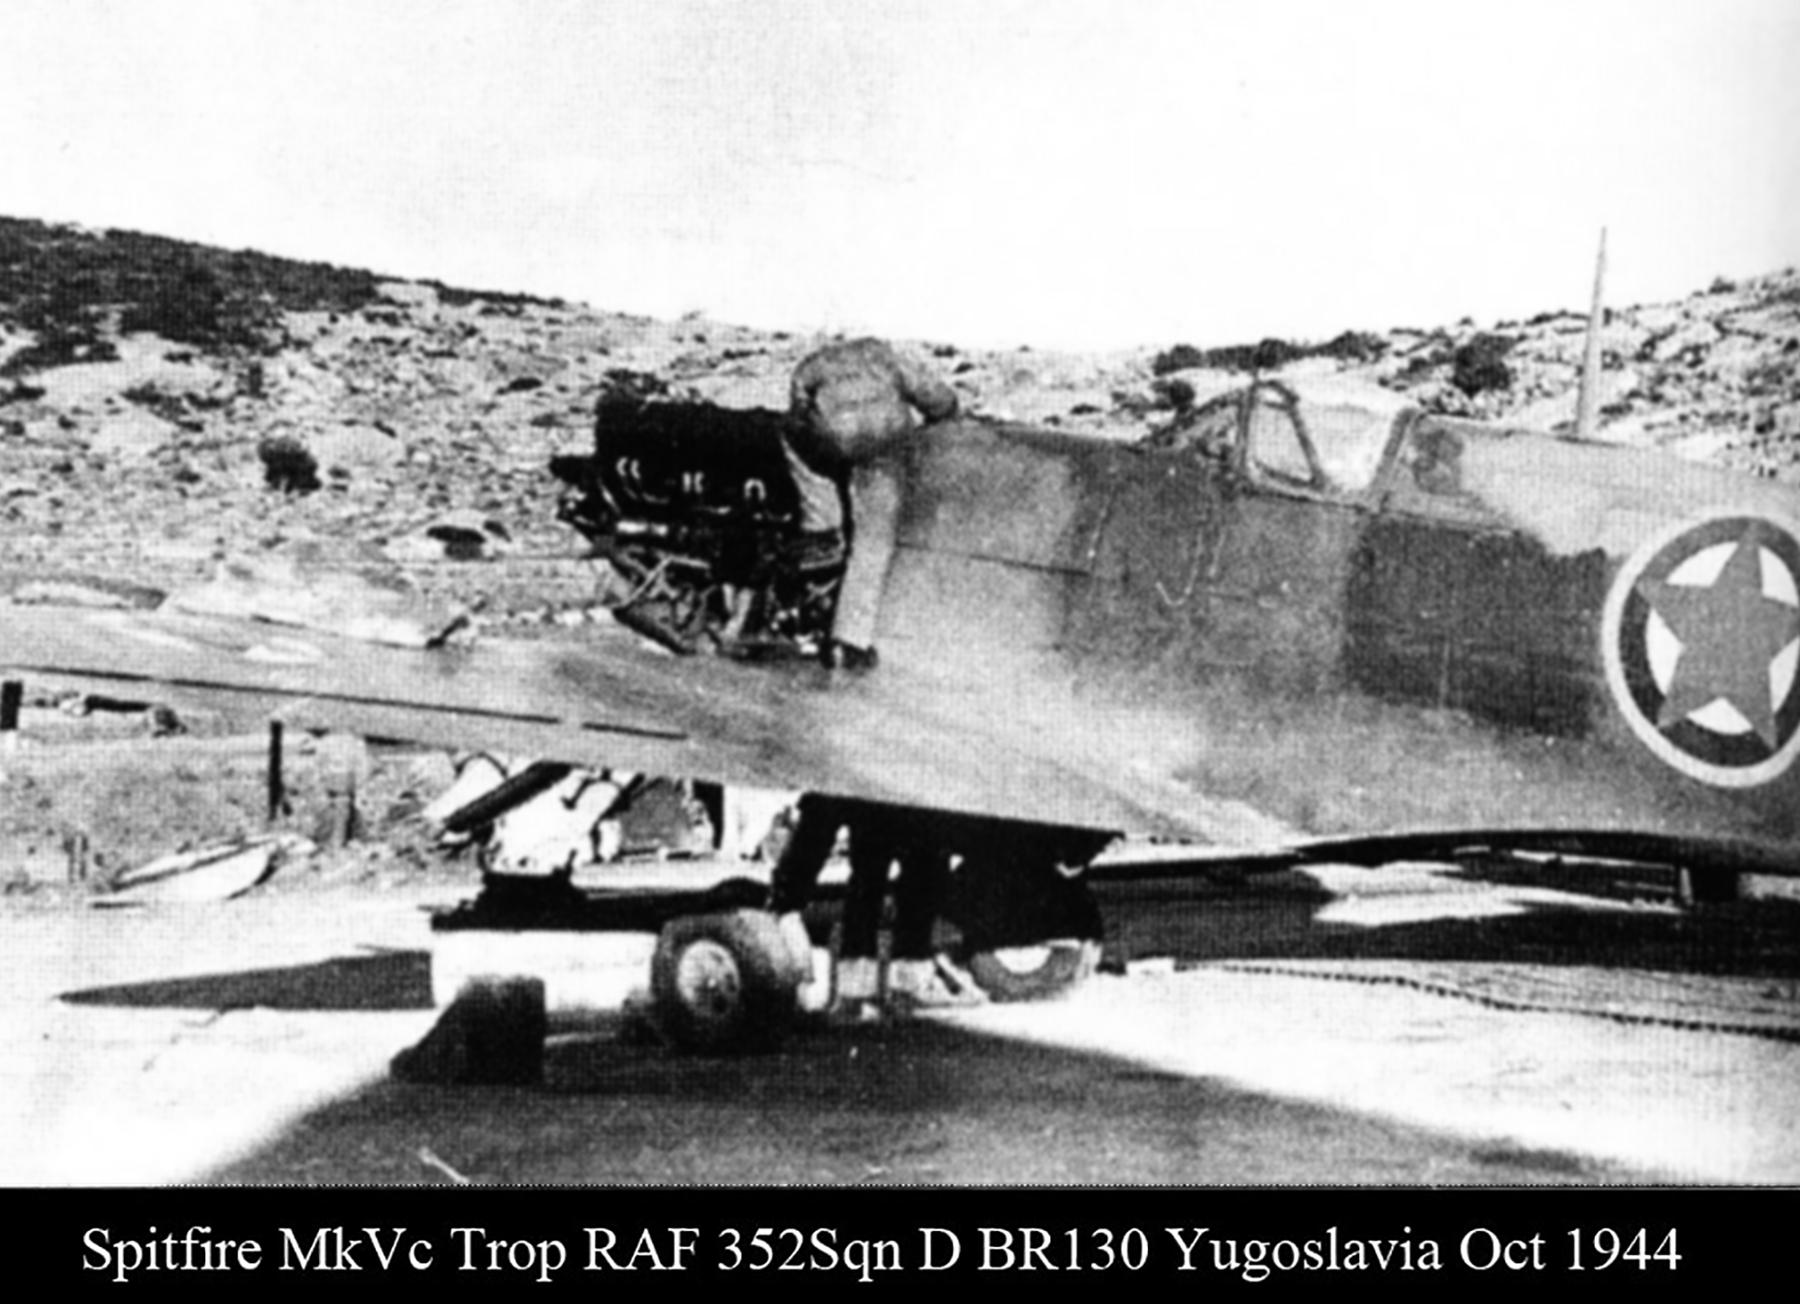 Spitfire MkVcTrop RAF 352Sqn D BR130 Yugoslavia Oct 1944 02